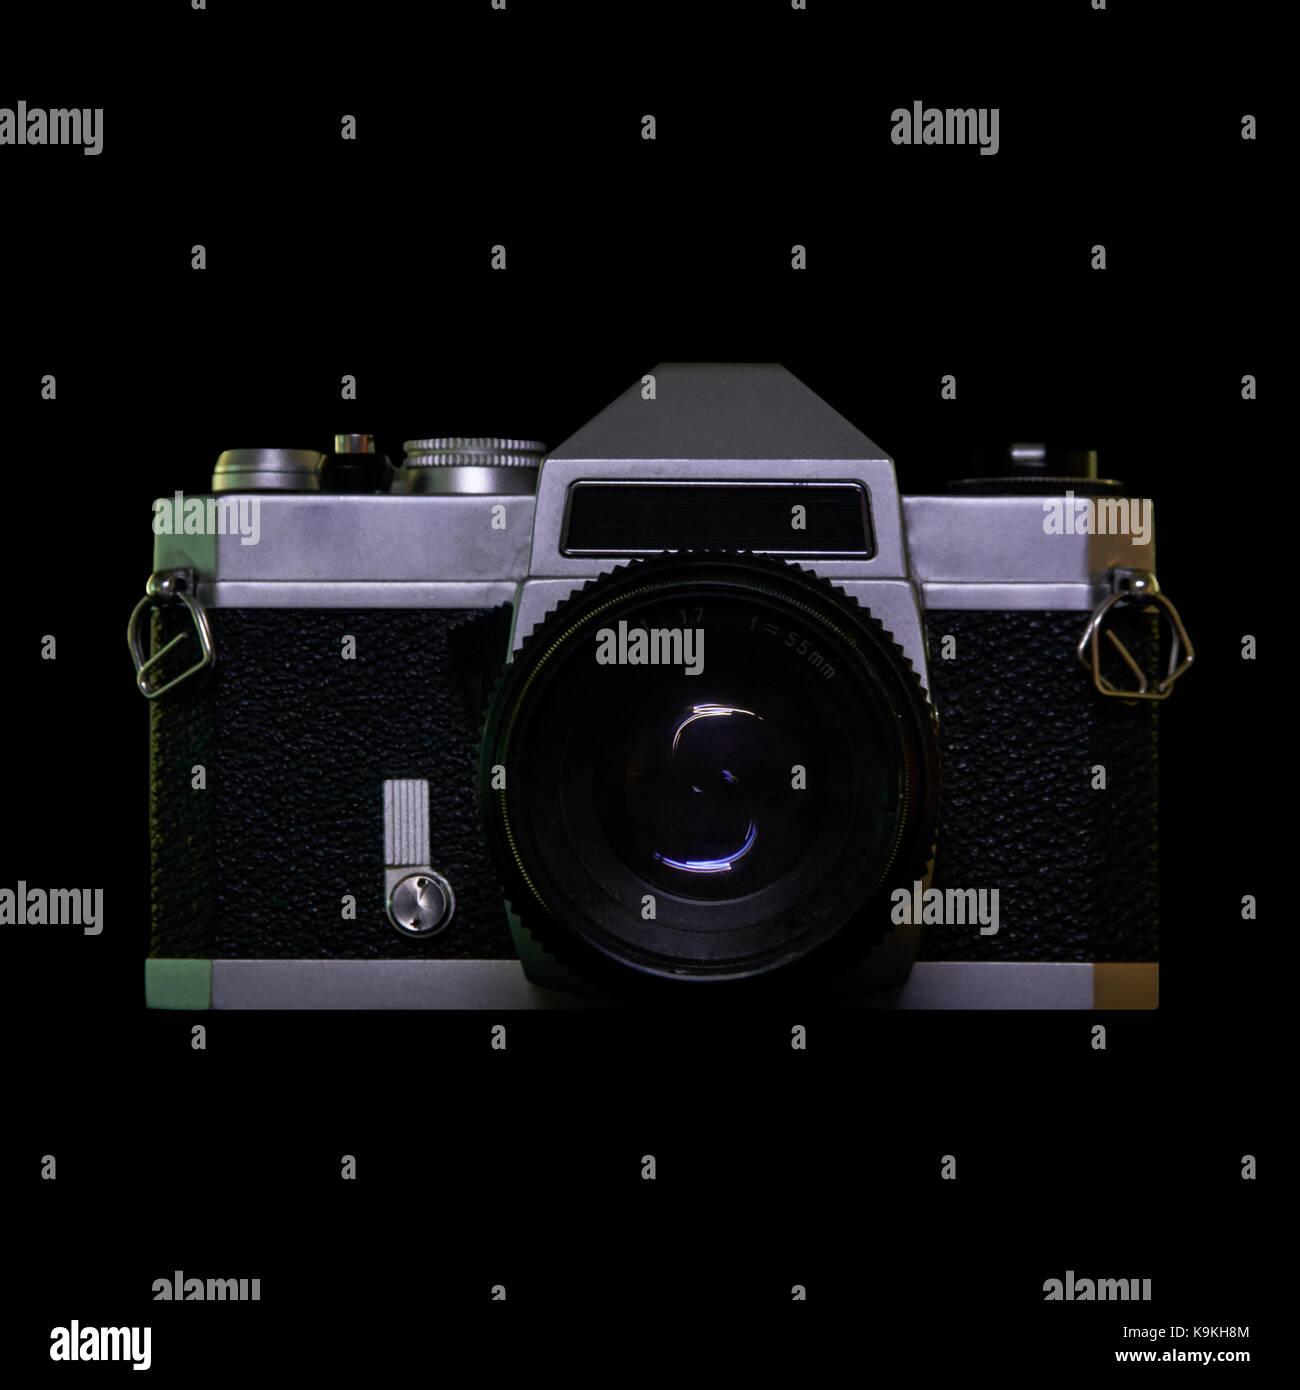 A vintage film camera on black background. - Stock Image